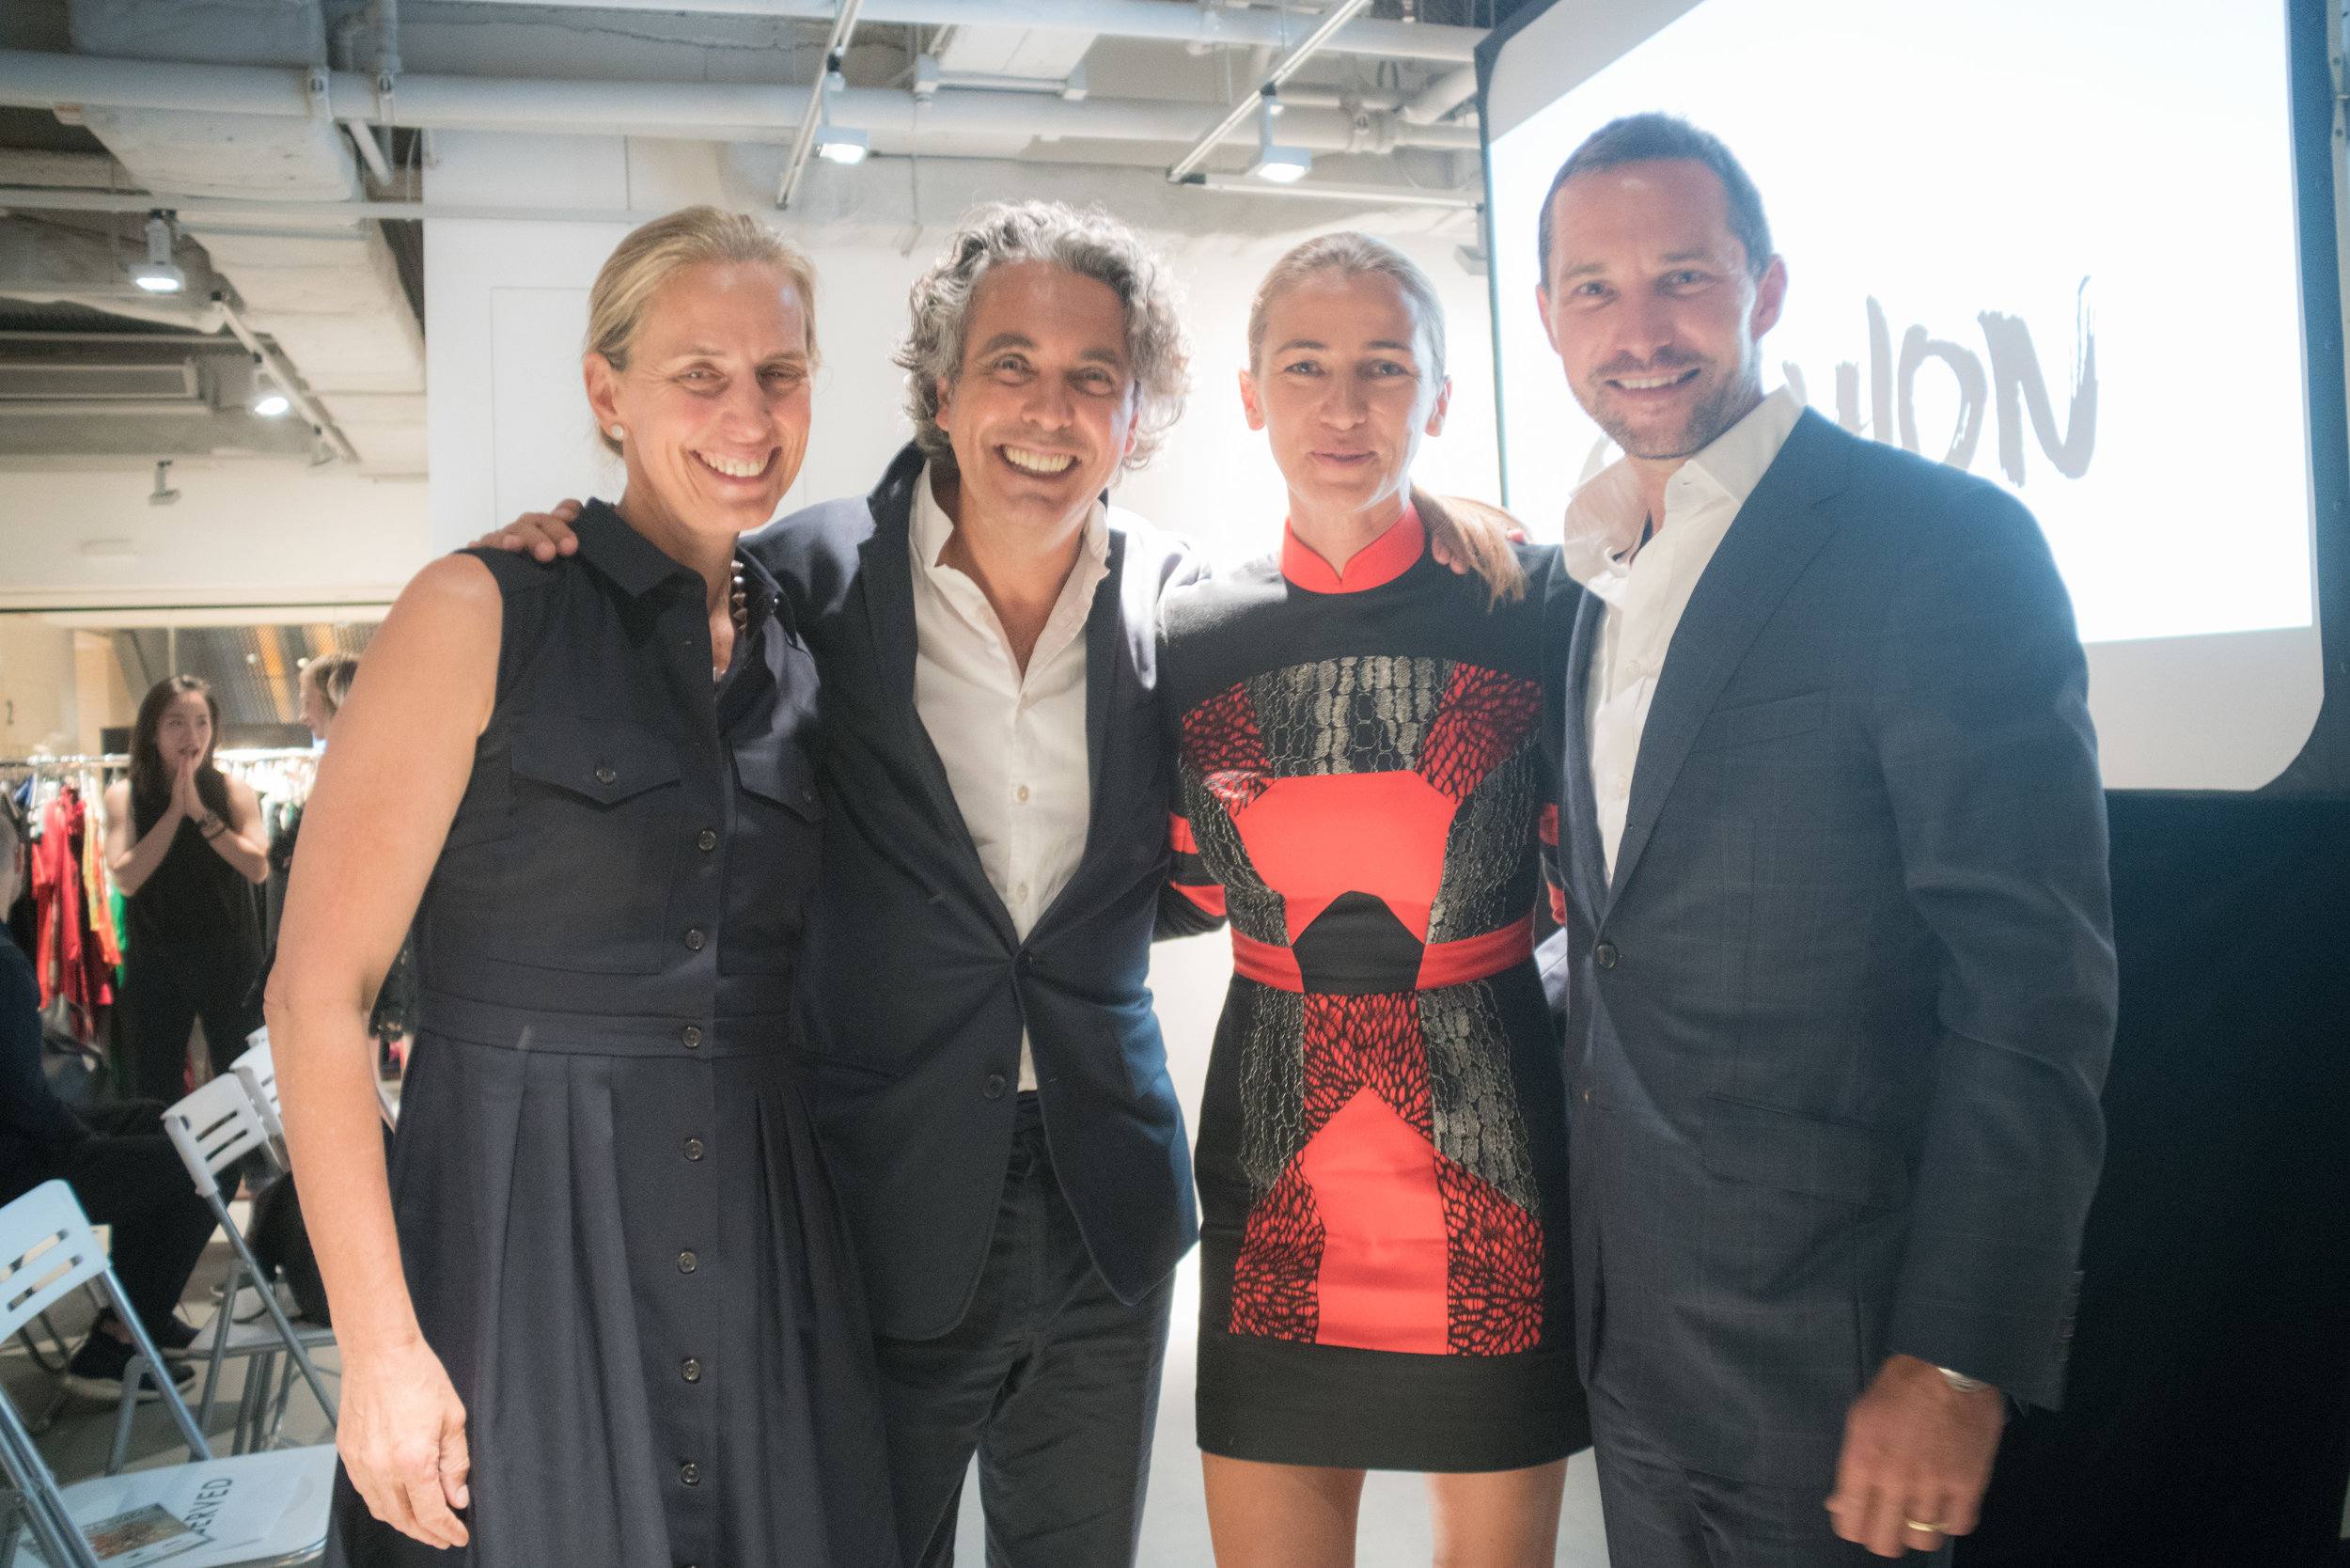 Lisa Genasci, Raphael le Masne de Chermont , Christina Dean, Christian Brun.jpg